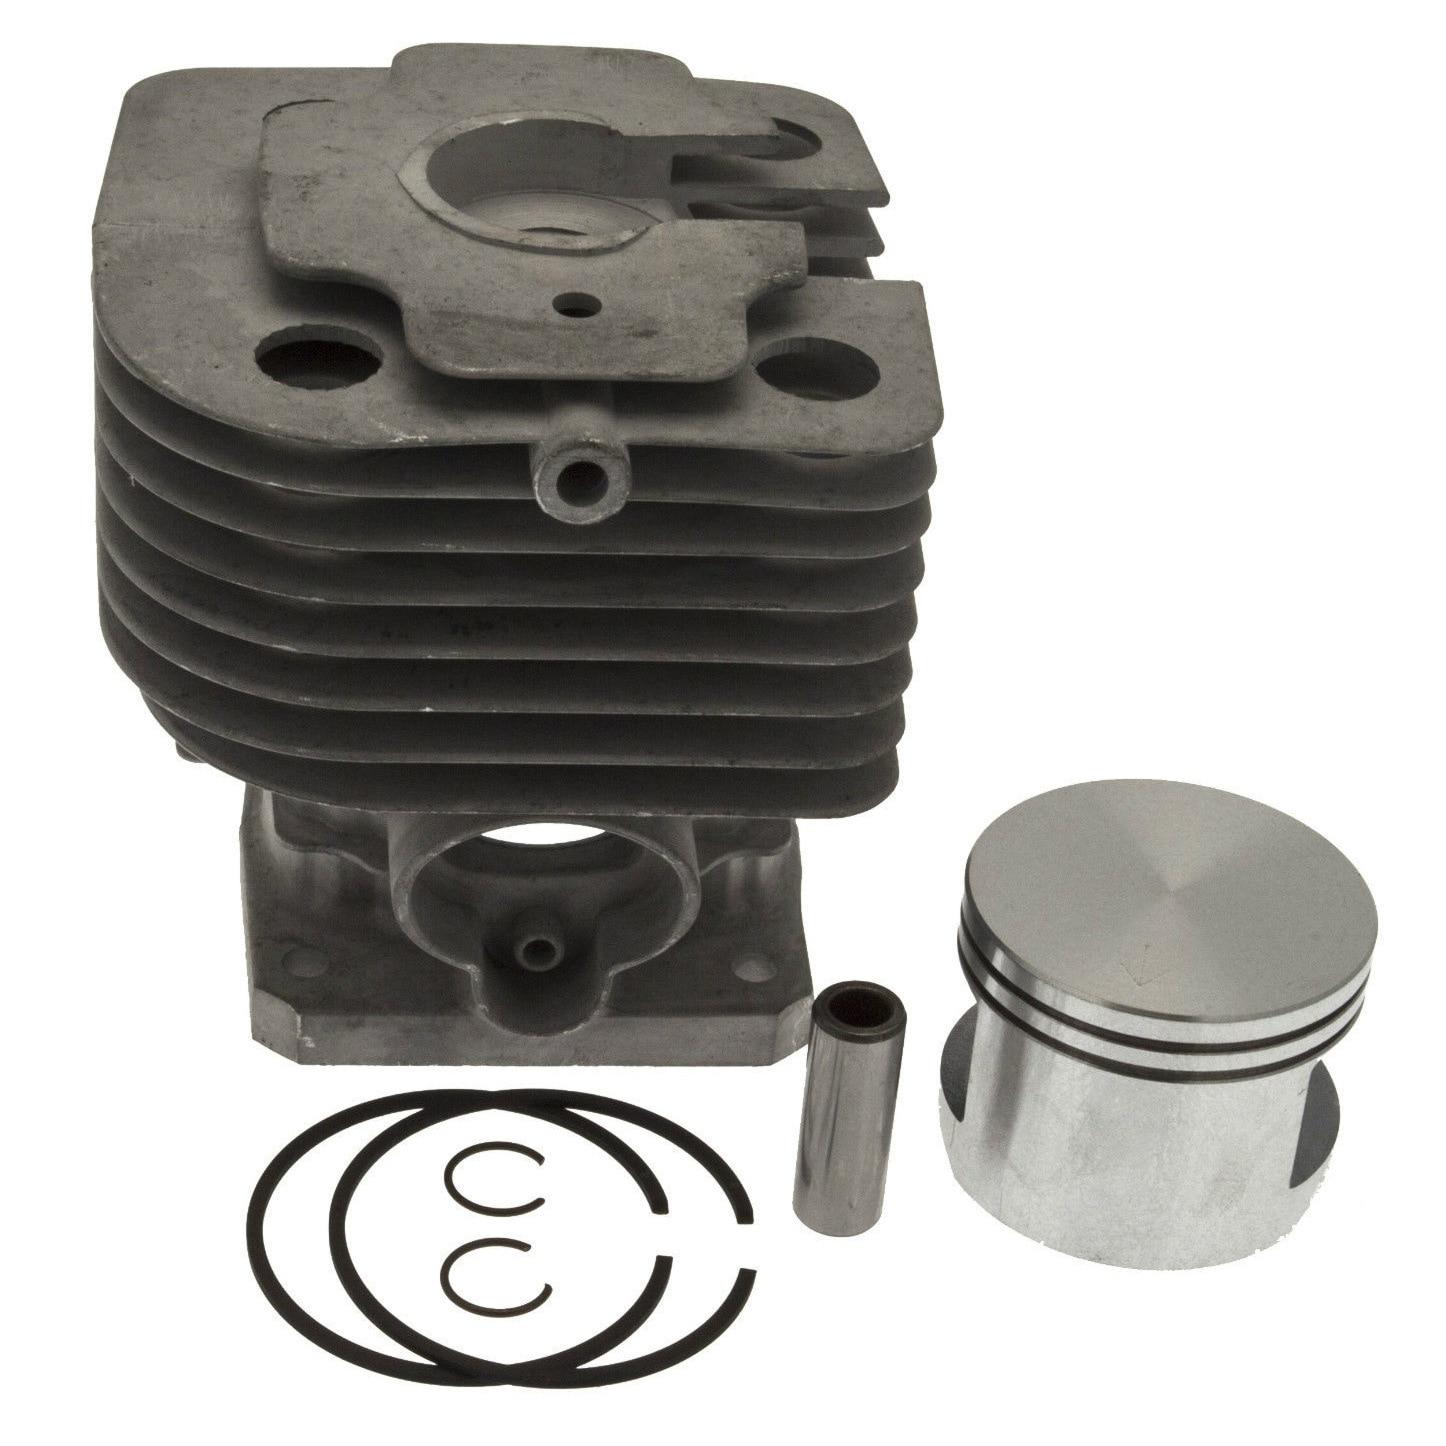 Kit de cilindro de sierra de cadena Stihl FS480 FR480 de 44mm